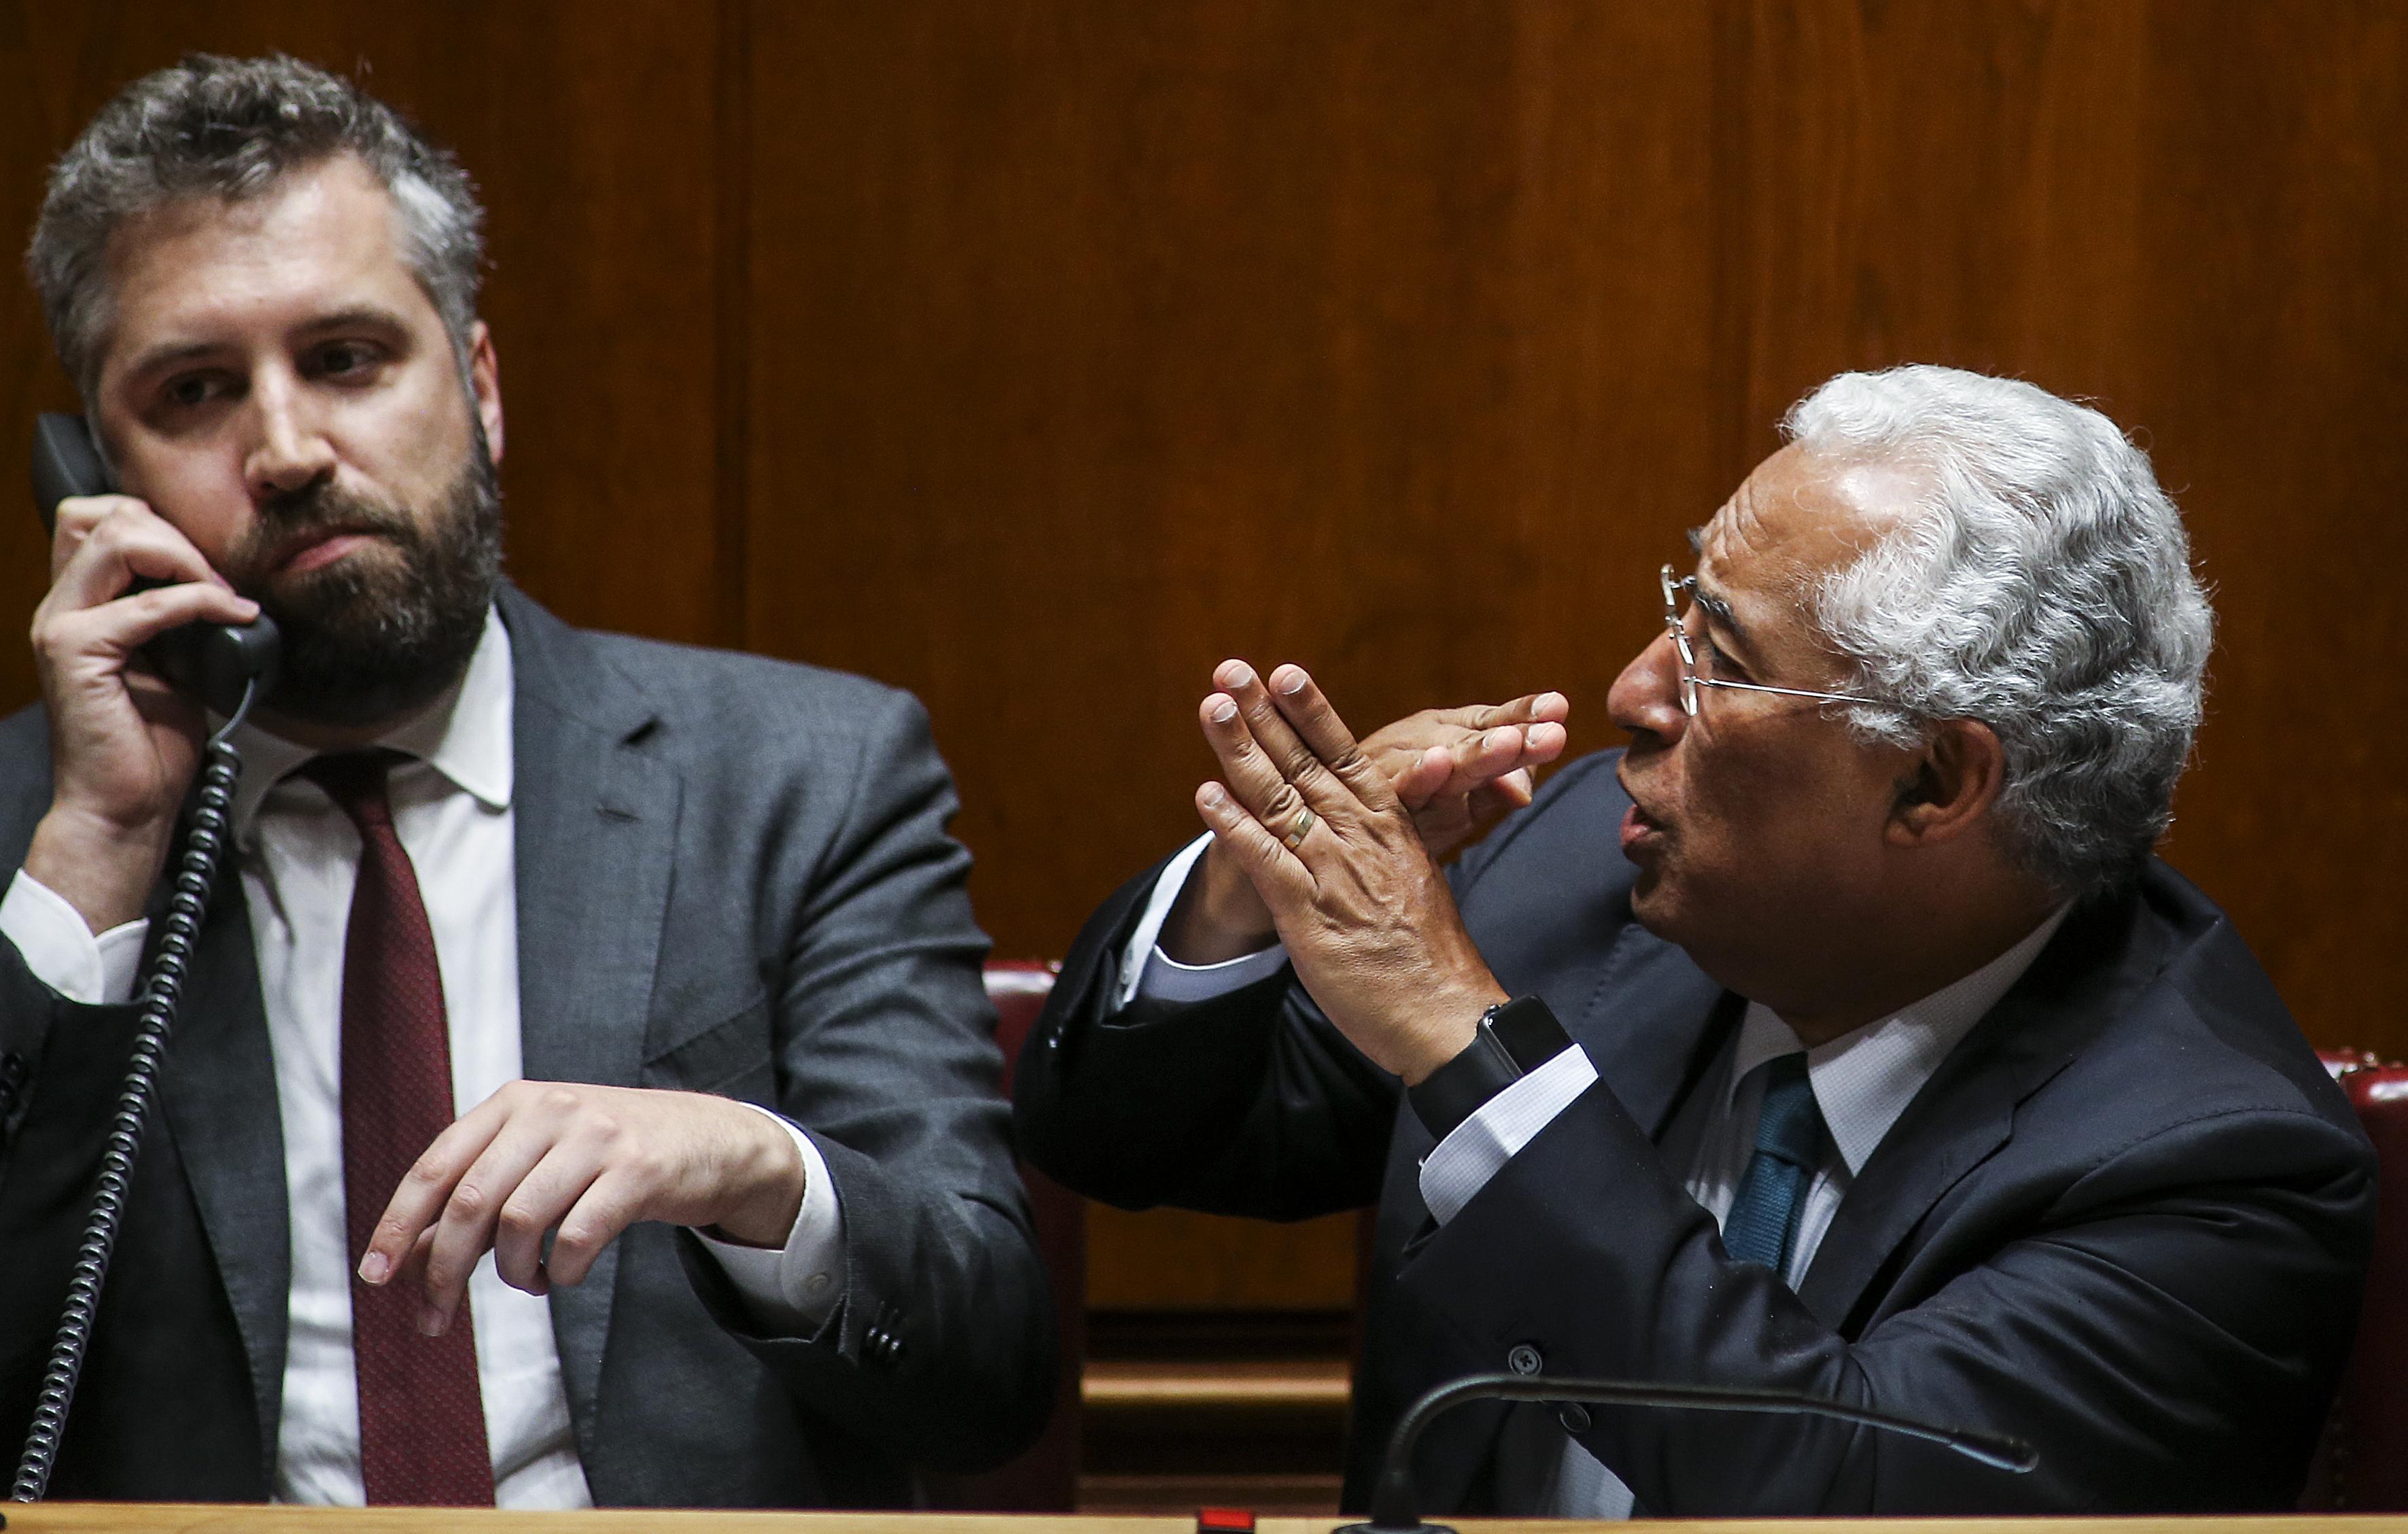 PSD acusa António Costa de regressar